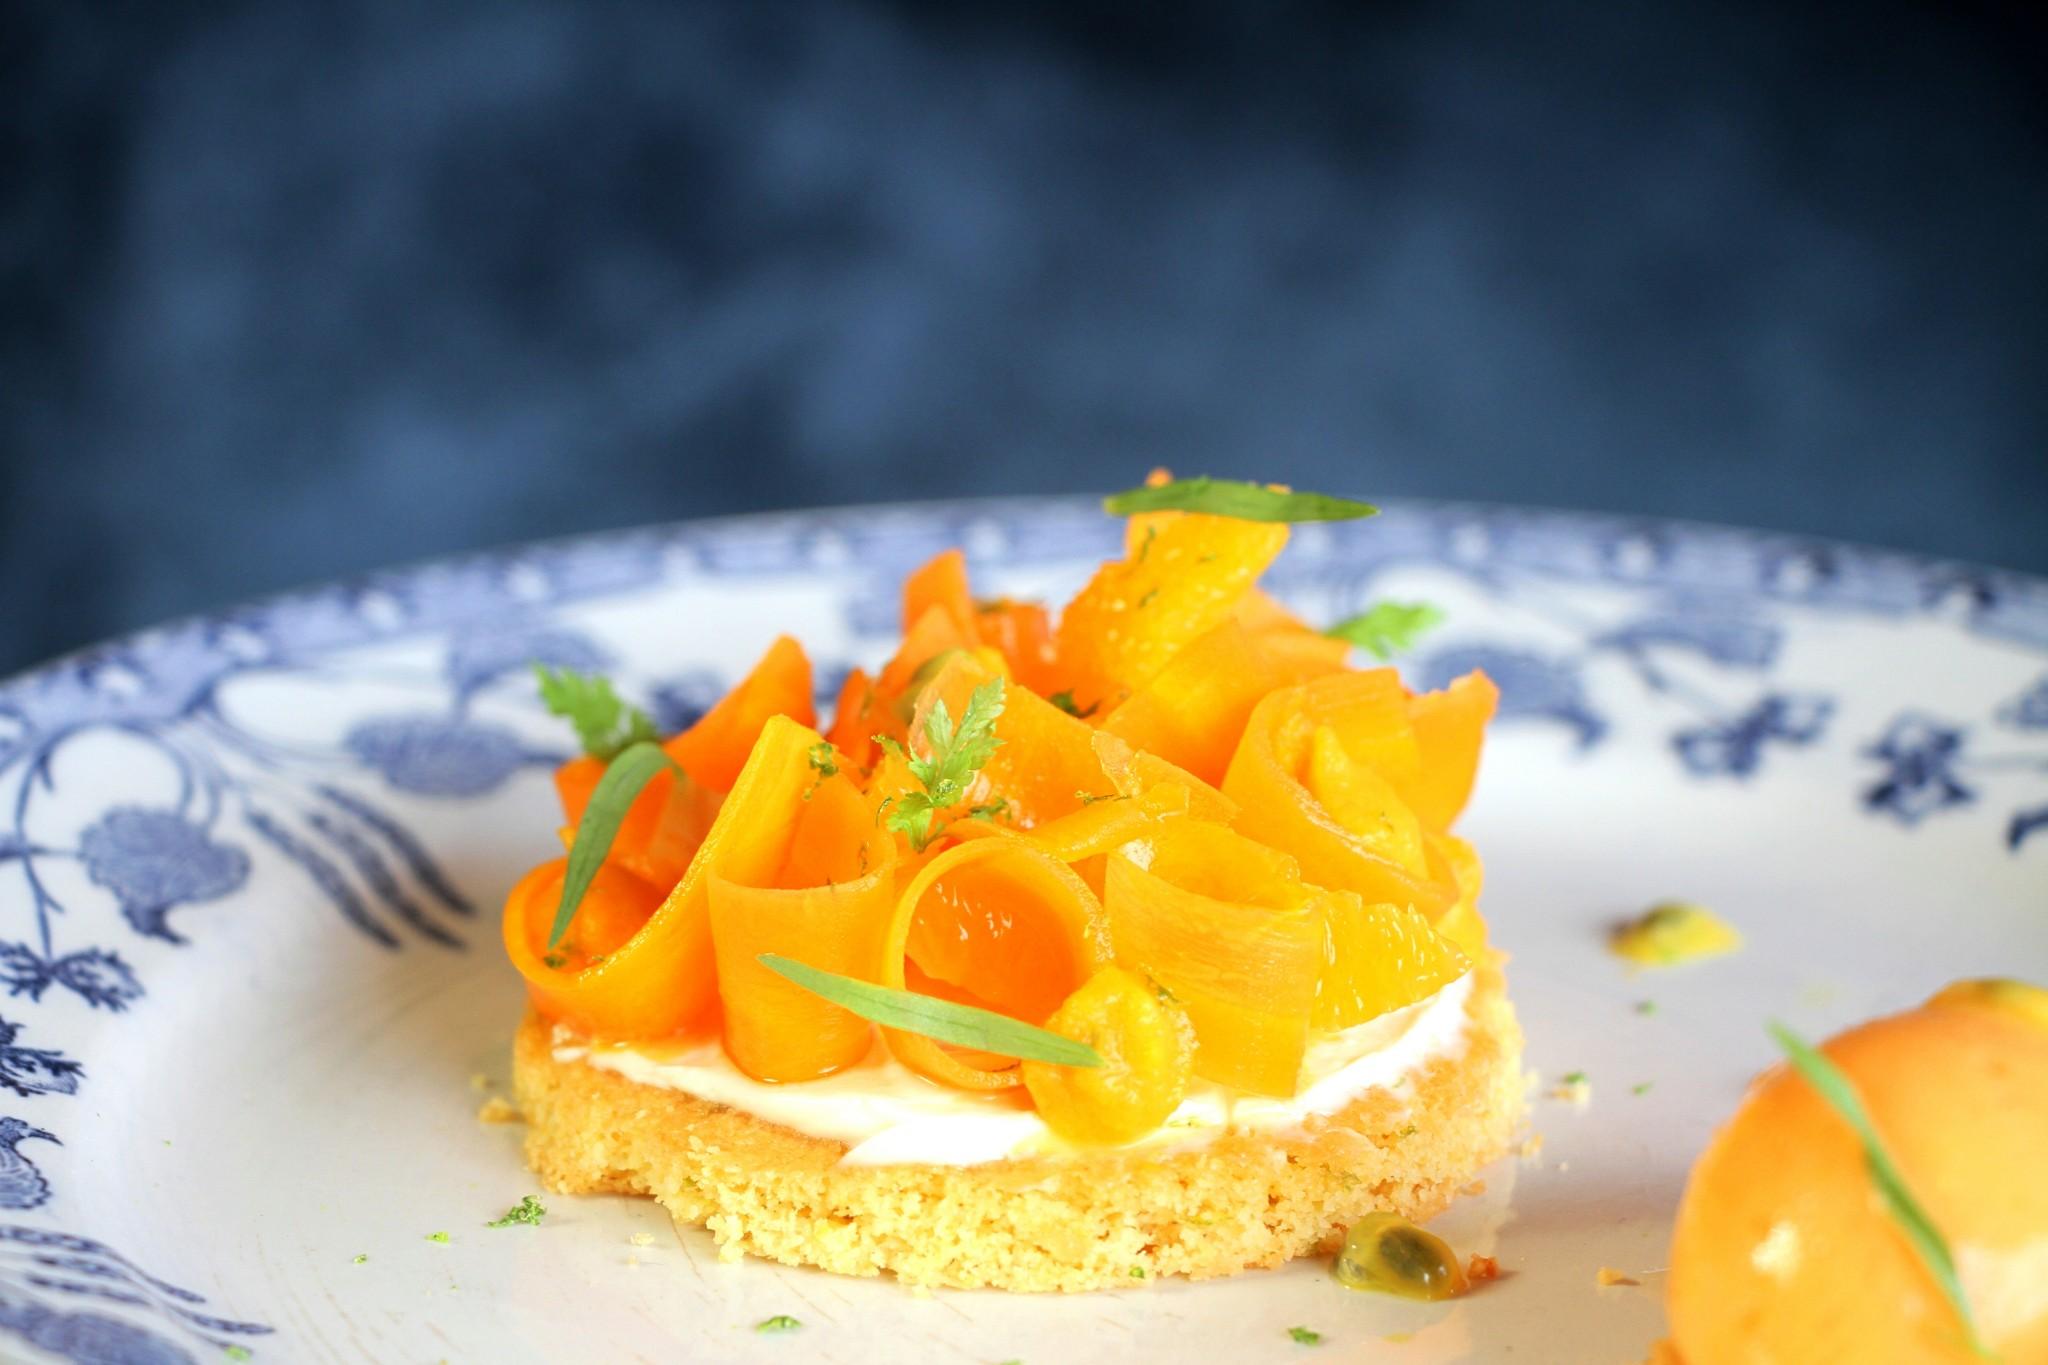 Bistro La-Haut, Suresnes, gastronomie, chef, restaurant, chefs, recette